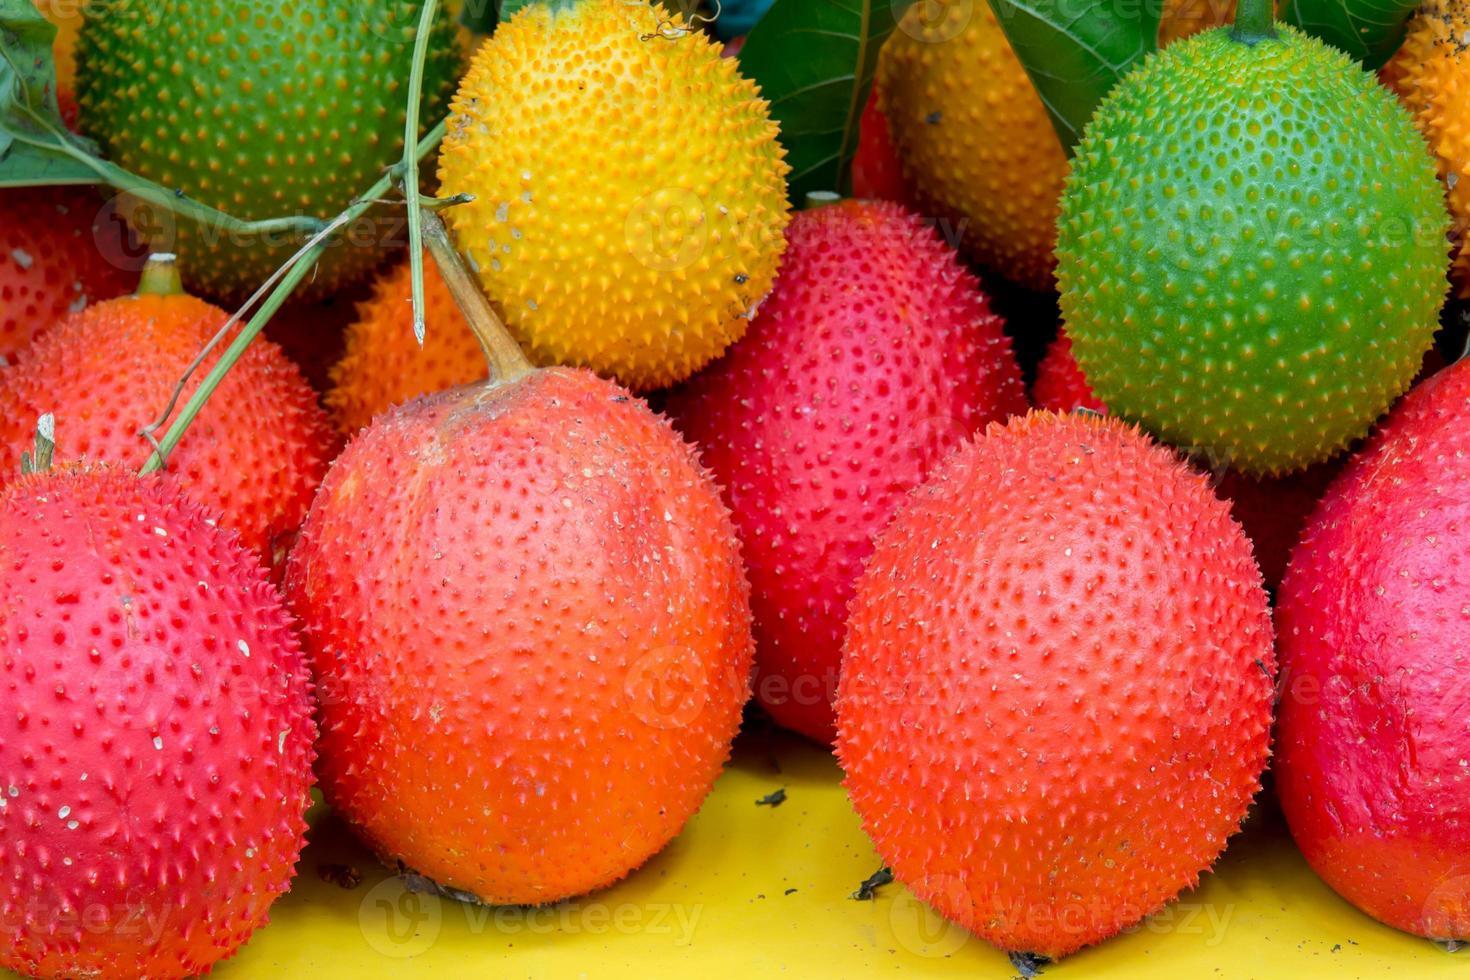 frutta sana frutta sana foto